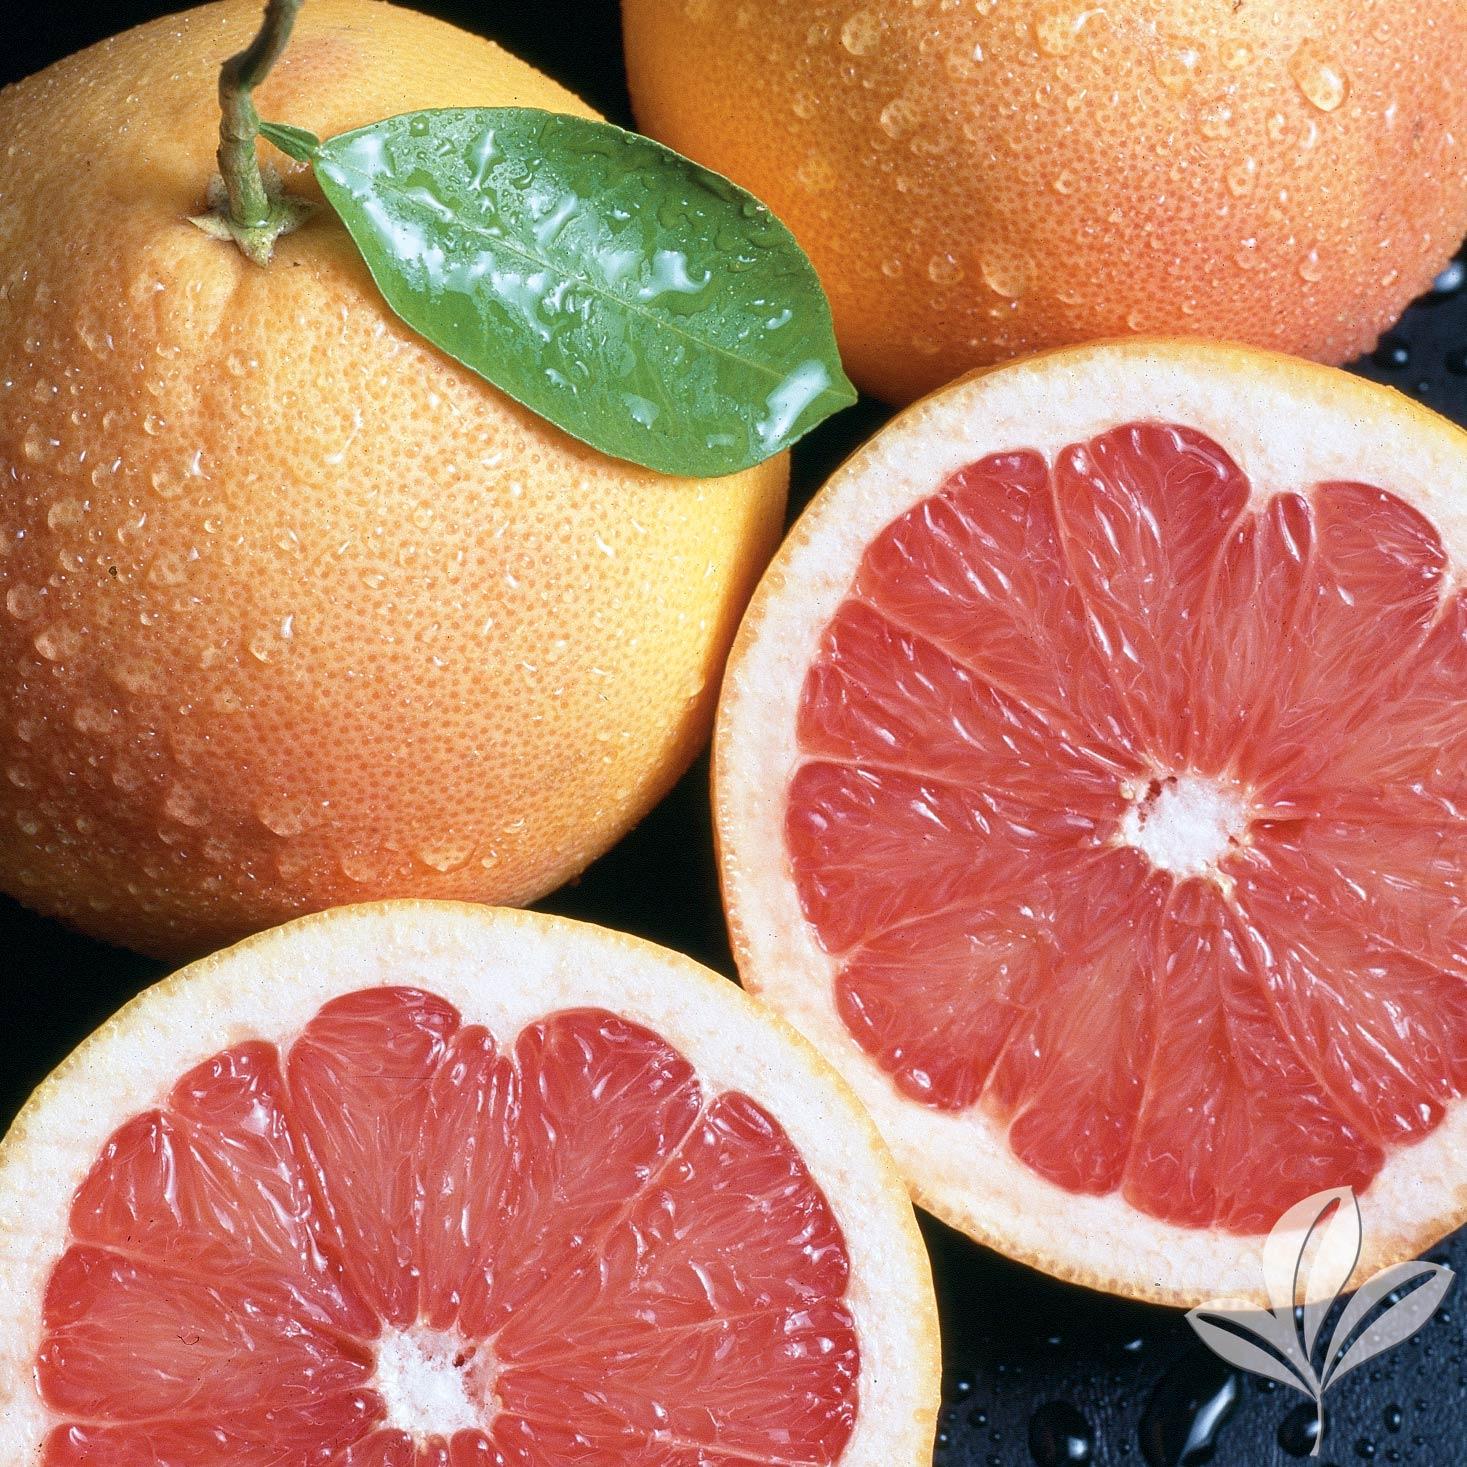 Red Grapefruit Chandler Red Pummelo 1026541.jpg